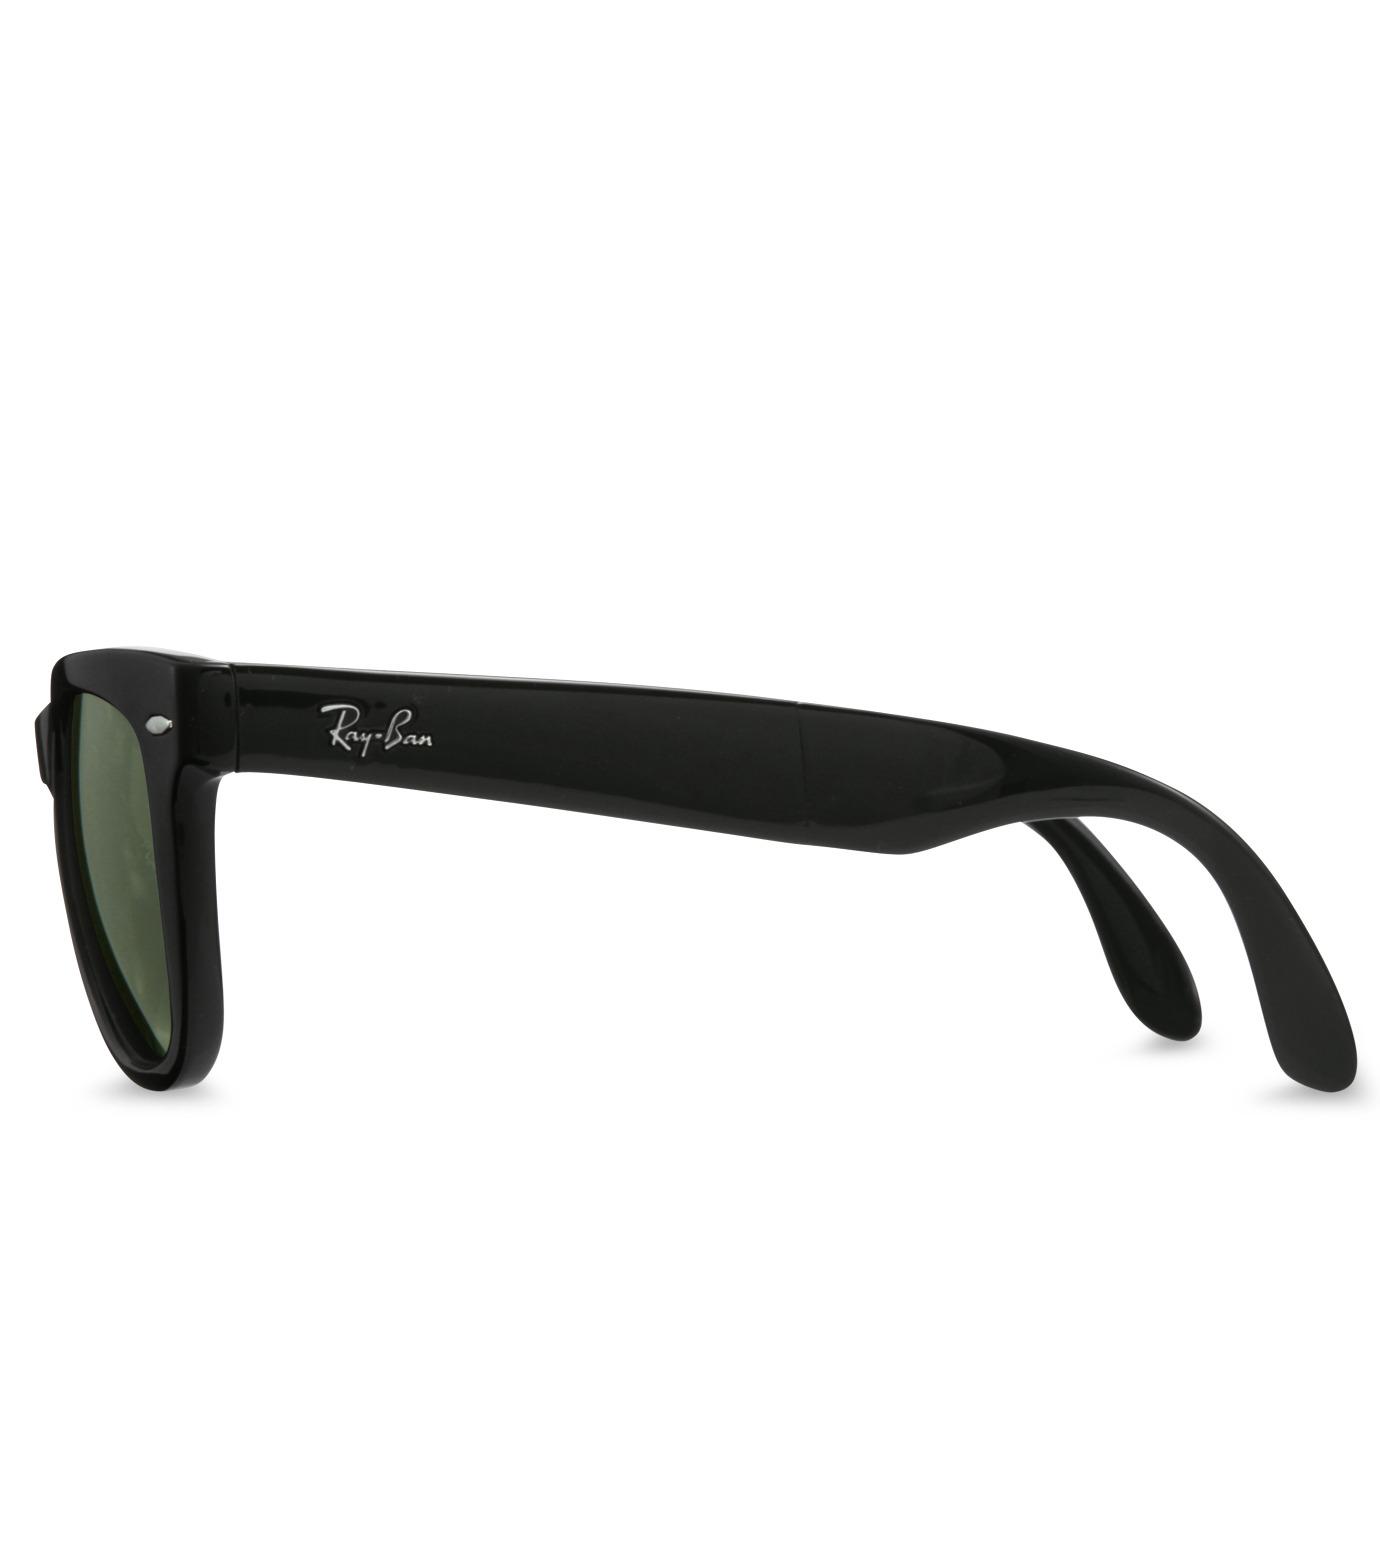 Ray-Ban(レイバン)のWayfarer Normal Black-BLACK(アイウェア/eyewear)-BR-4105-13 拡大詳細画像2